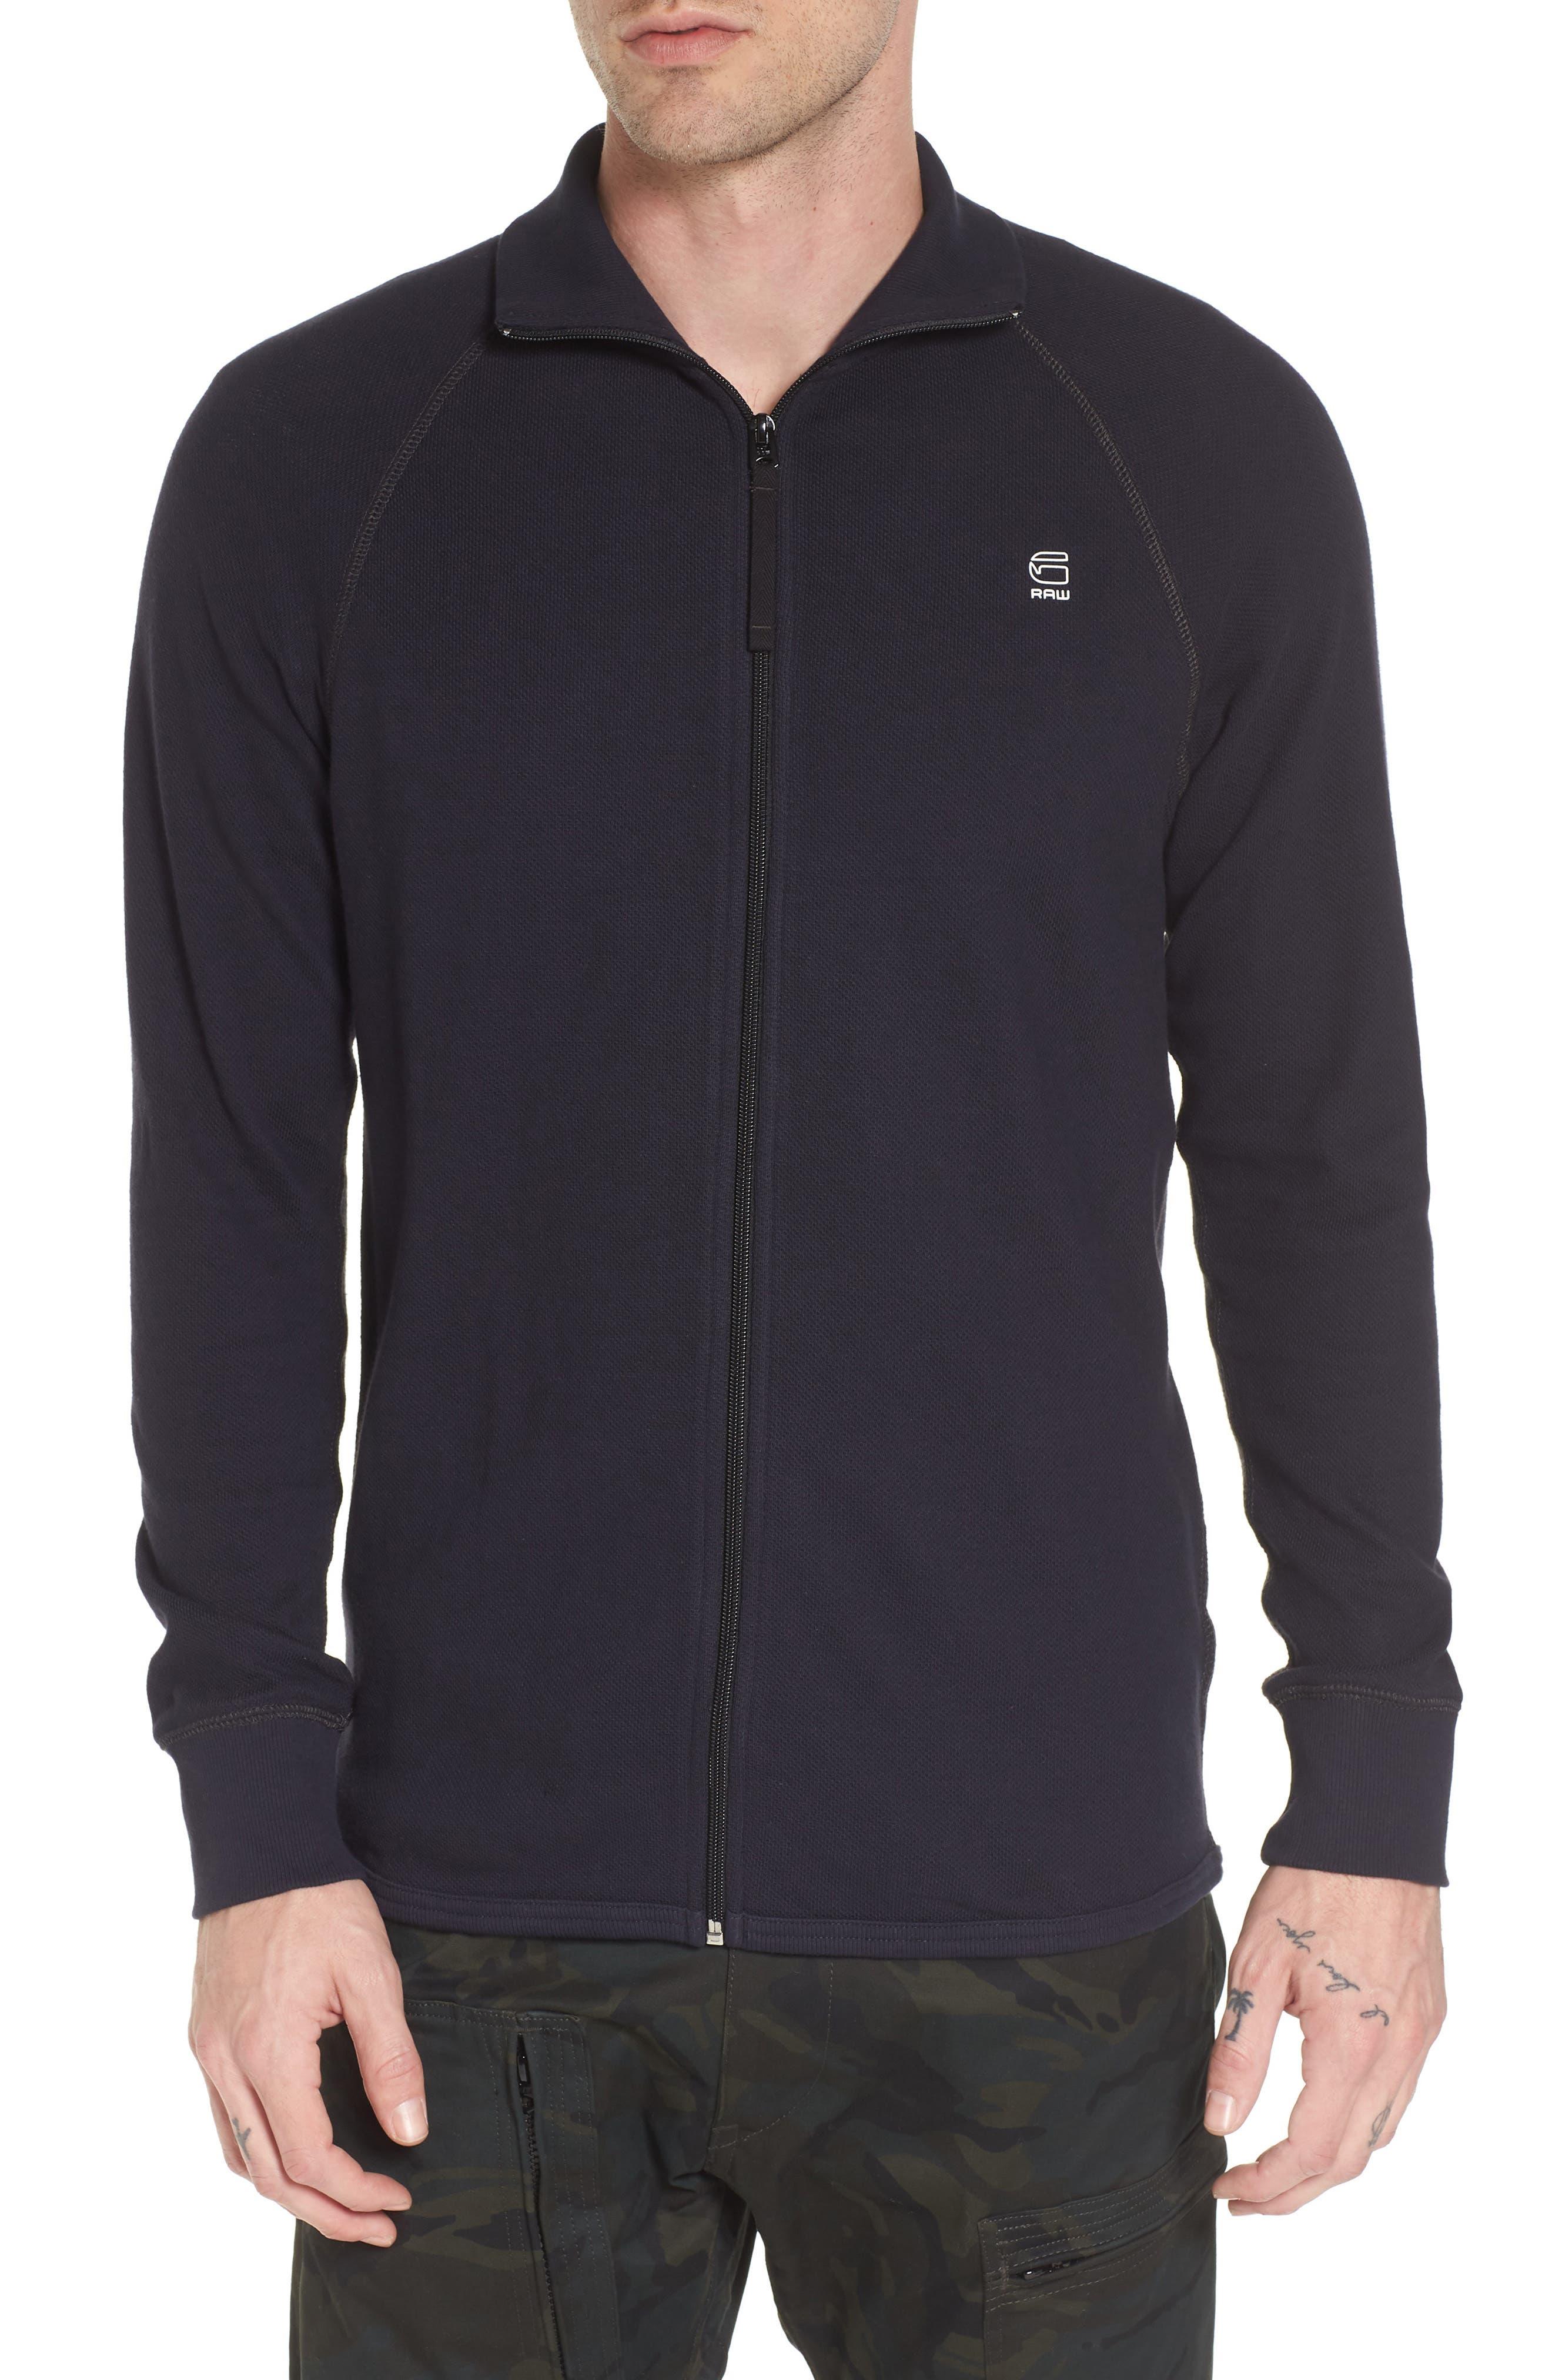 Jirgi Front Zip Sweater,                         Main,                         color, Dark Naval Blue